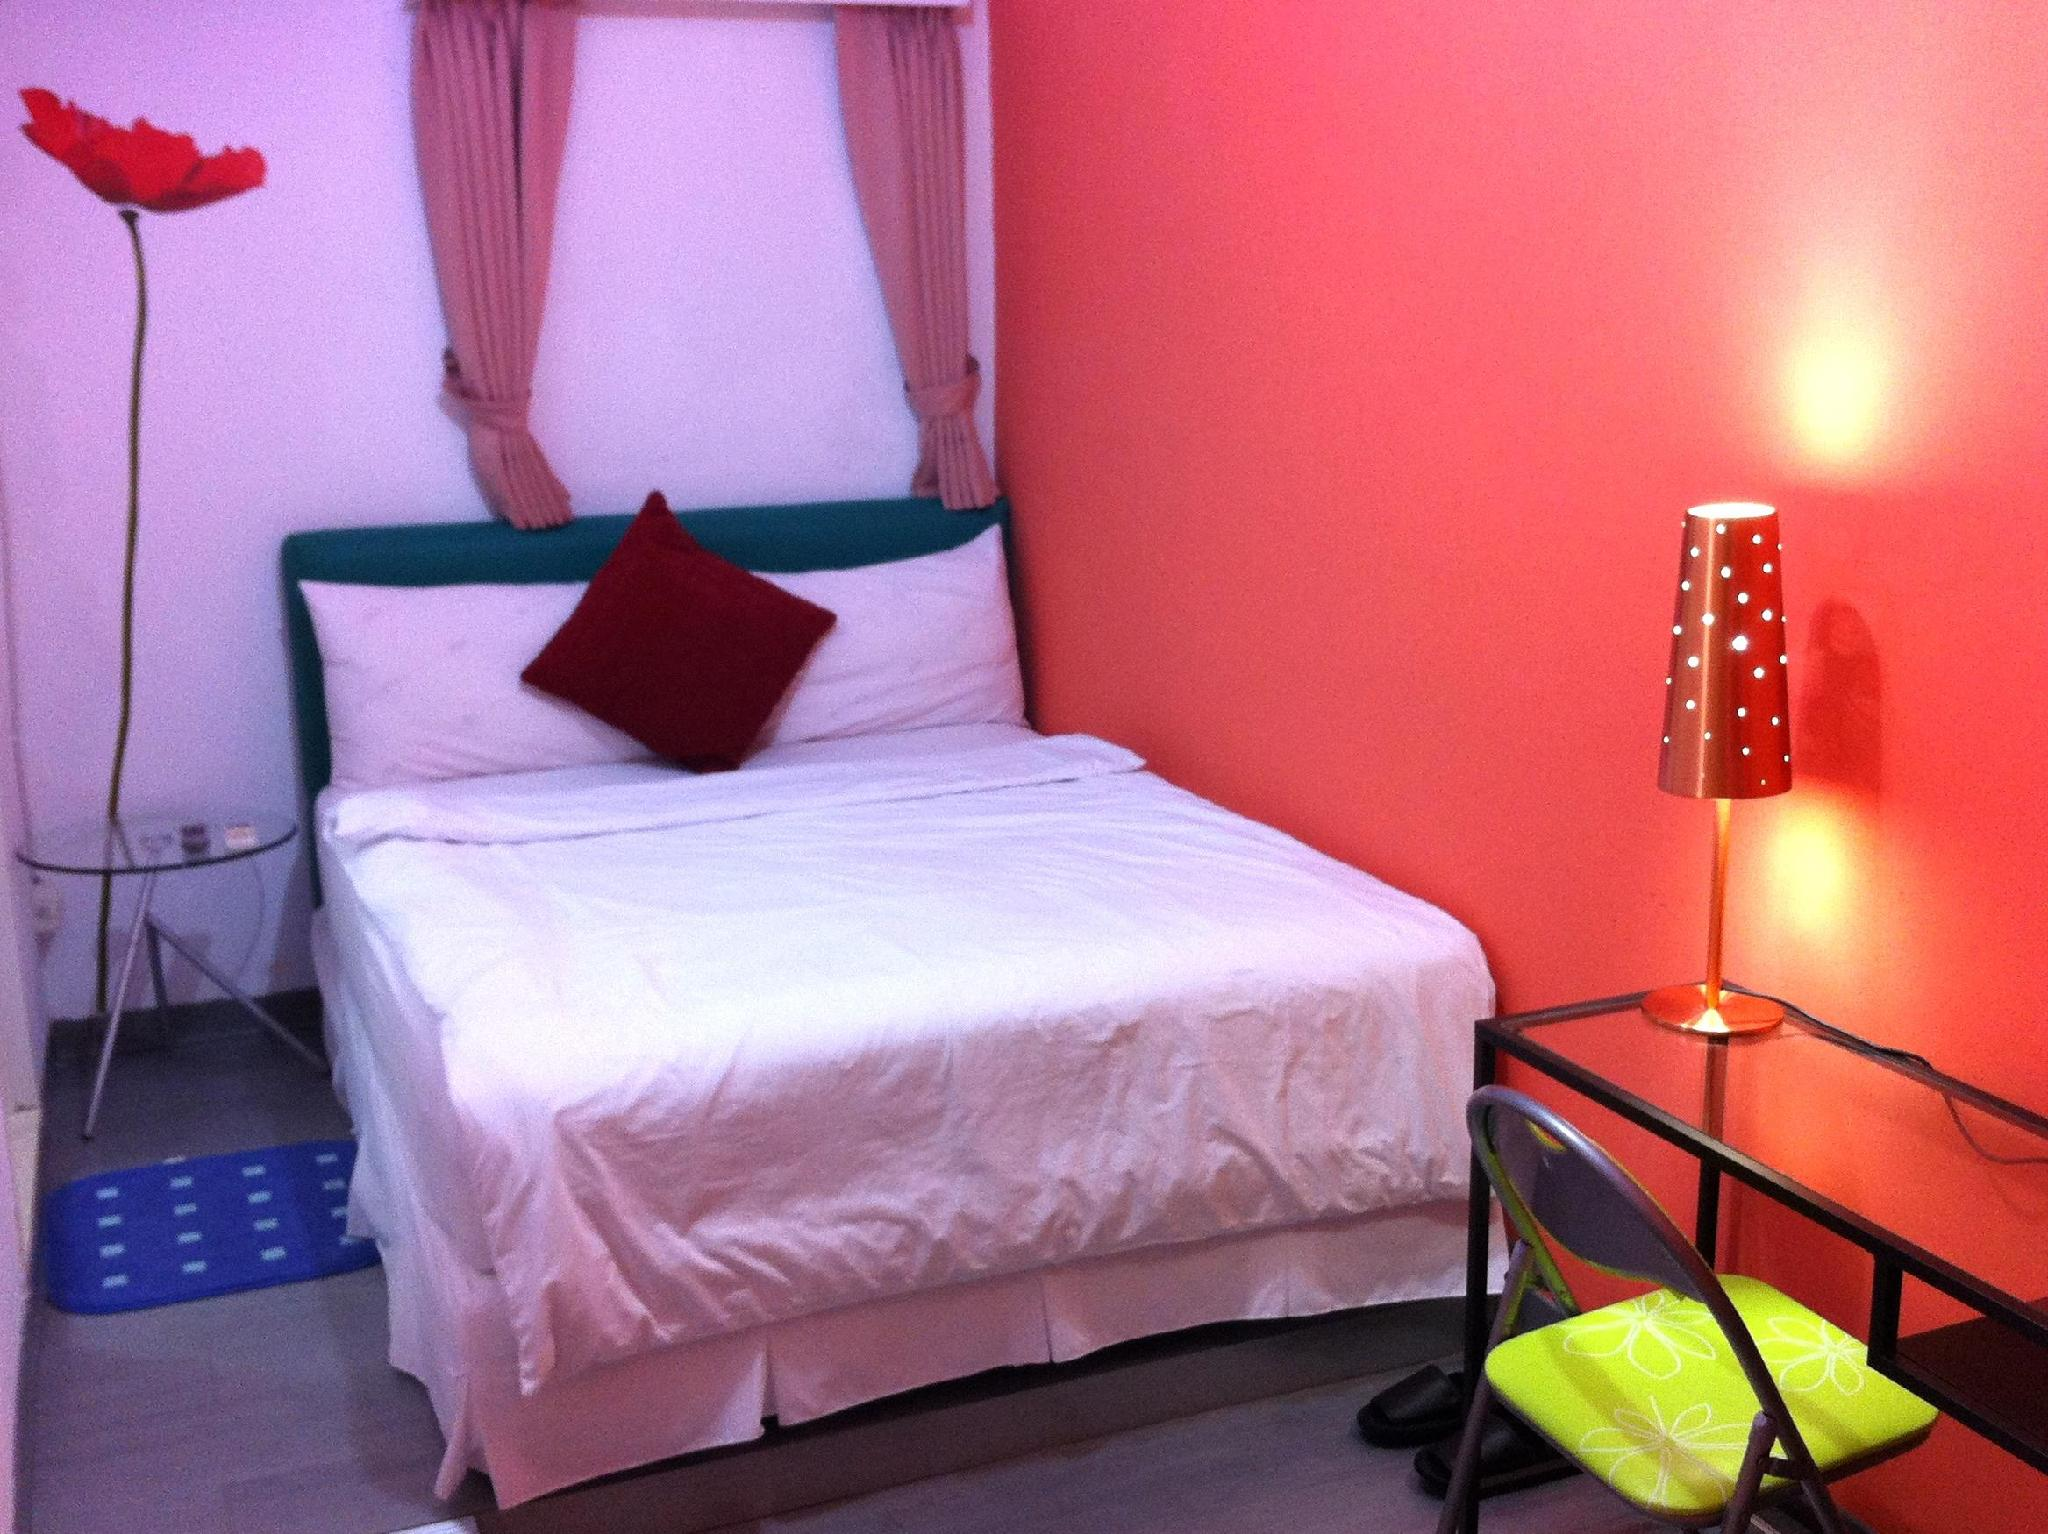 Hotel Green Lake View Apartment 2BR by Herry 1 - Jalan Dewi Sartika Gang Masjid Ar-Riyadh - Tangerang